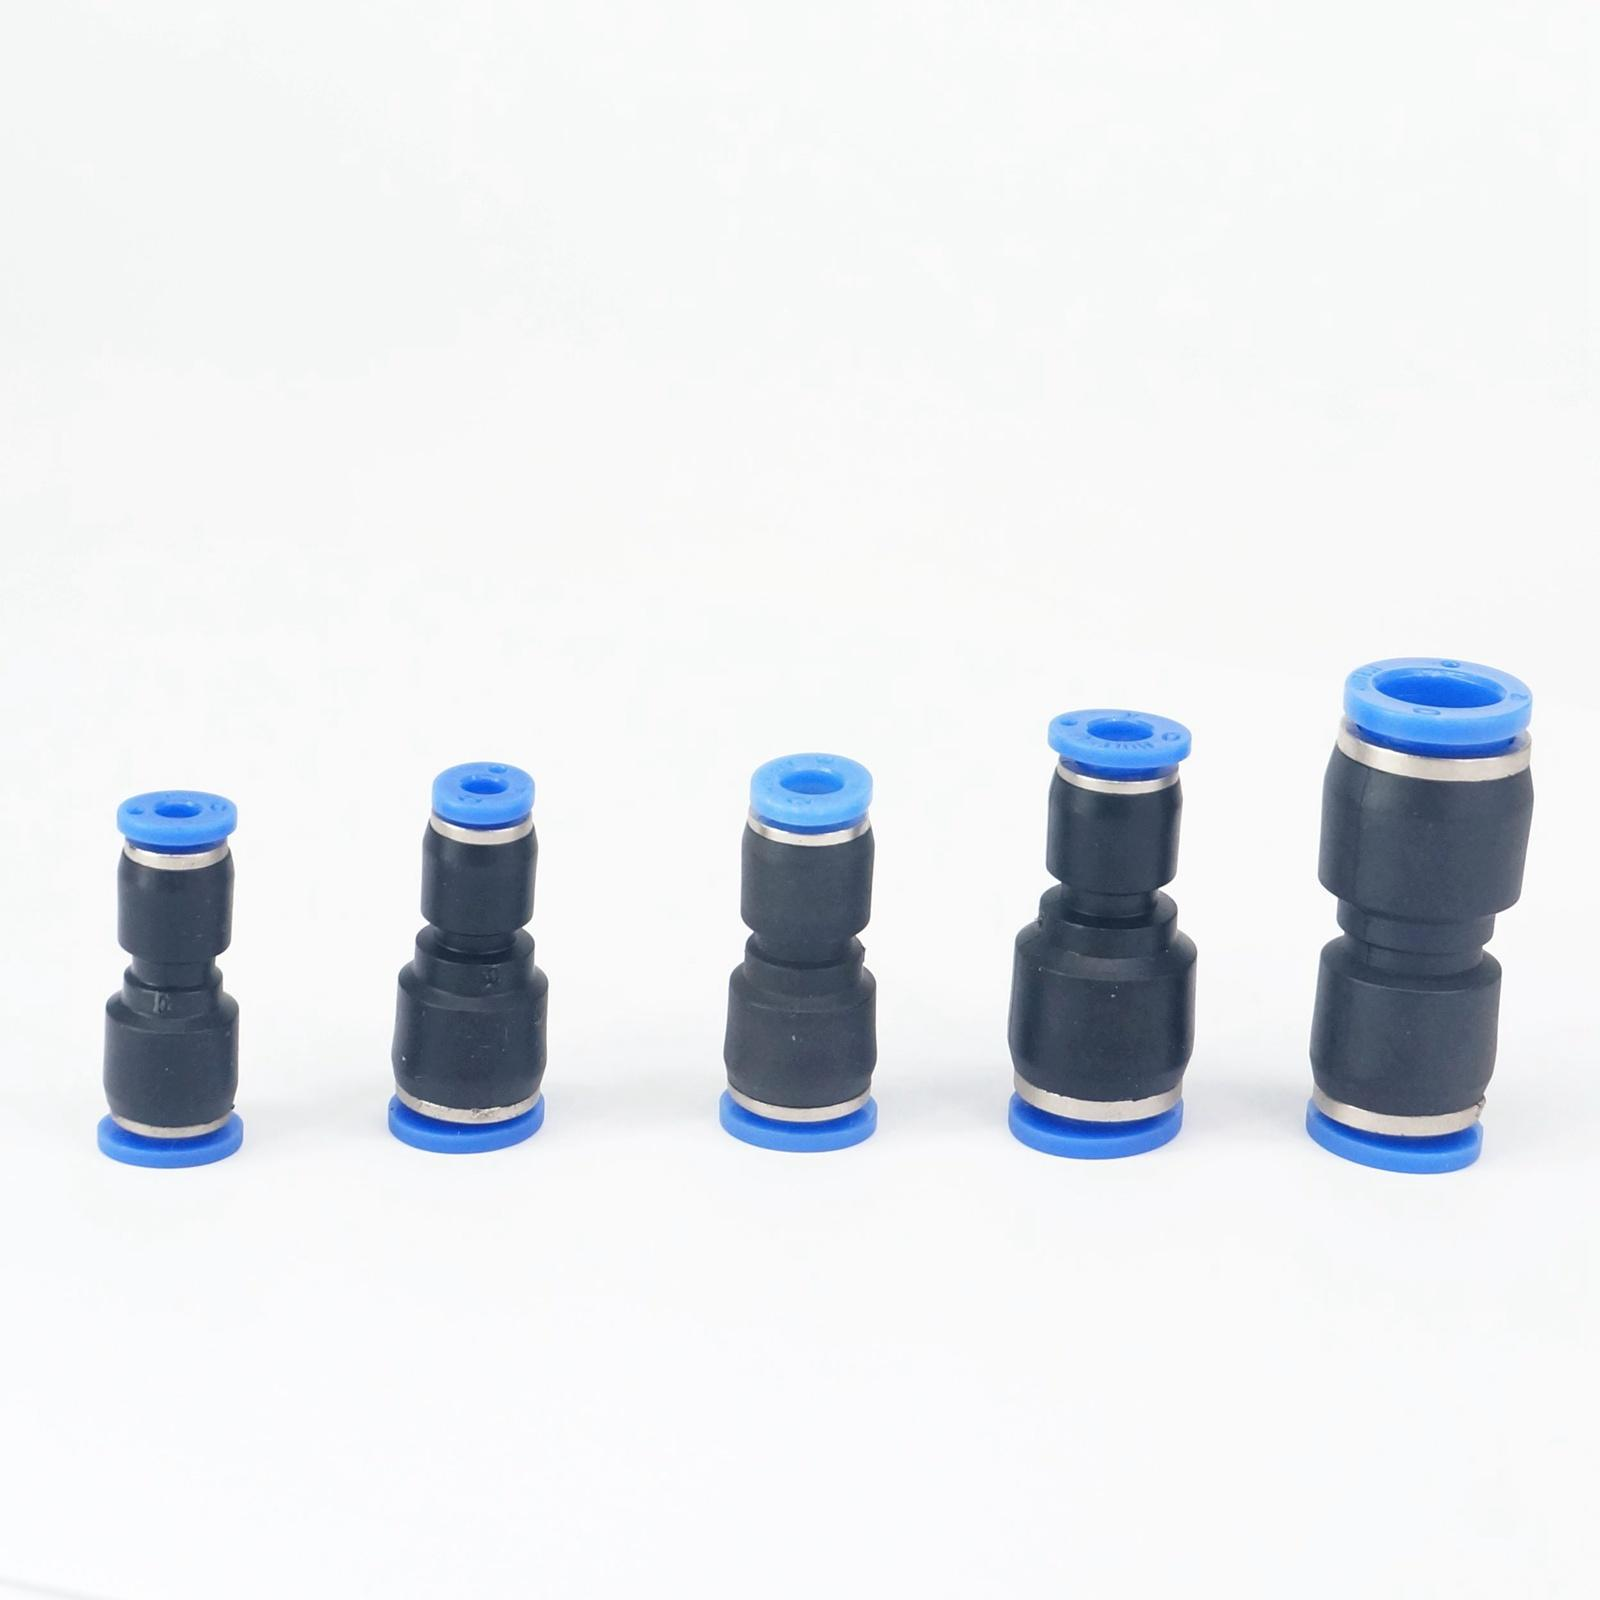 Sanitär Gehorsam 10 Stücke Fit Rohr O/d 4-6/6-8/8-4/10-6/10-8/12-8/12-10/16-12mm Reduzierung Pneumatische Pushfit Minderer Anschluss Fitting Um Jeden Preis